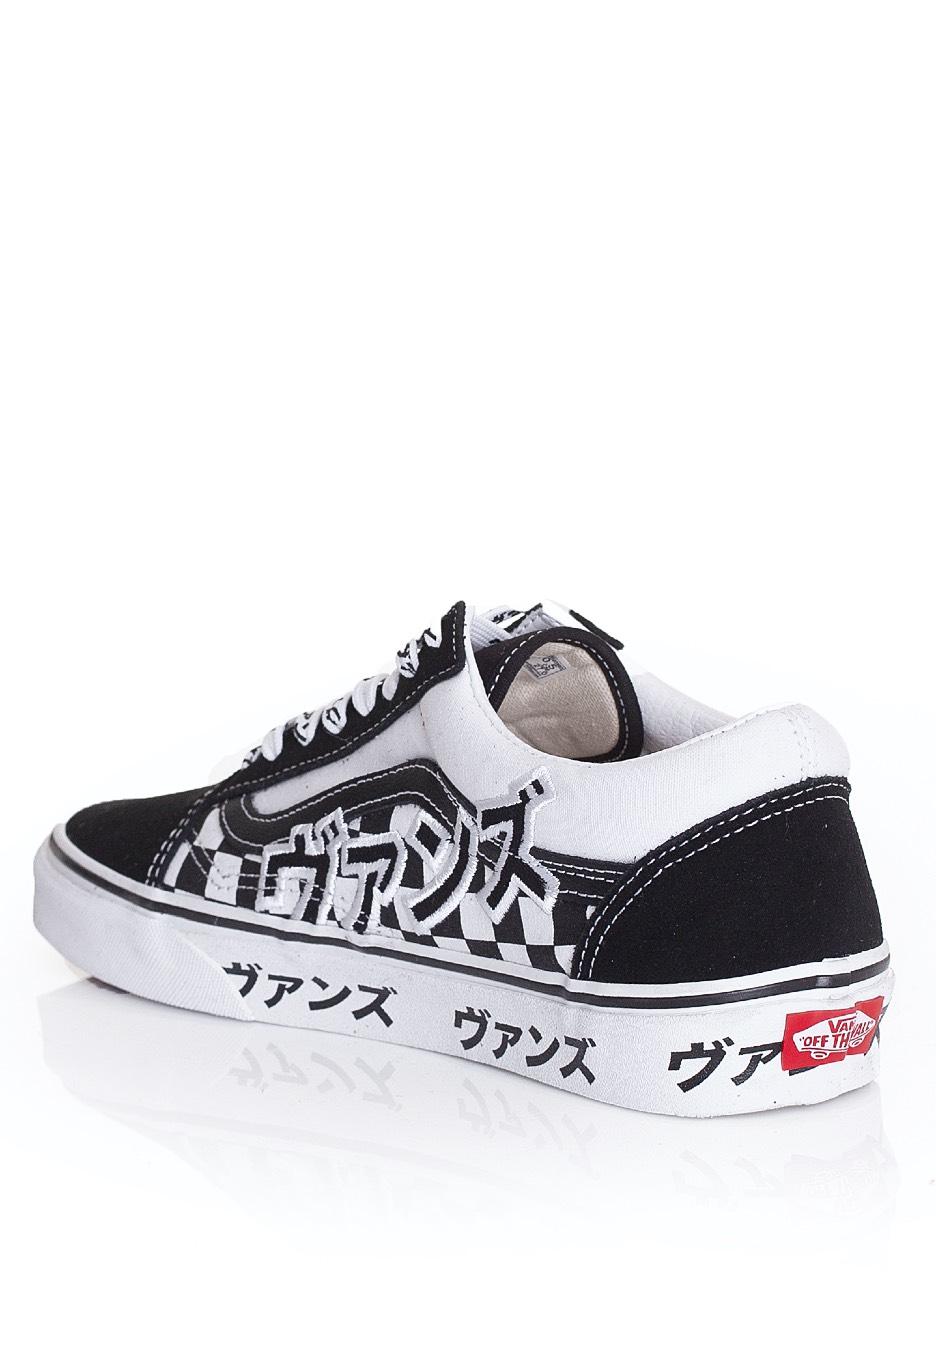 Vans - Old Skool (Japanese Type) Black/Tru - Shoes - Impericon.com US